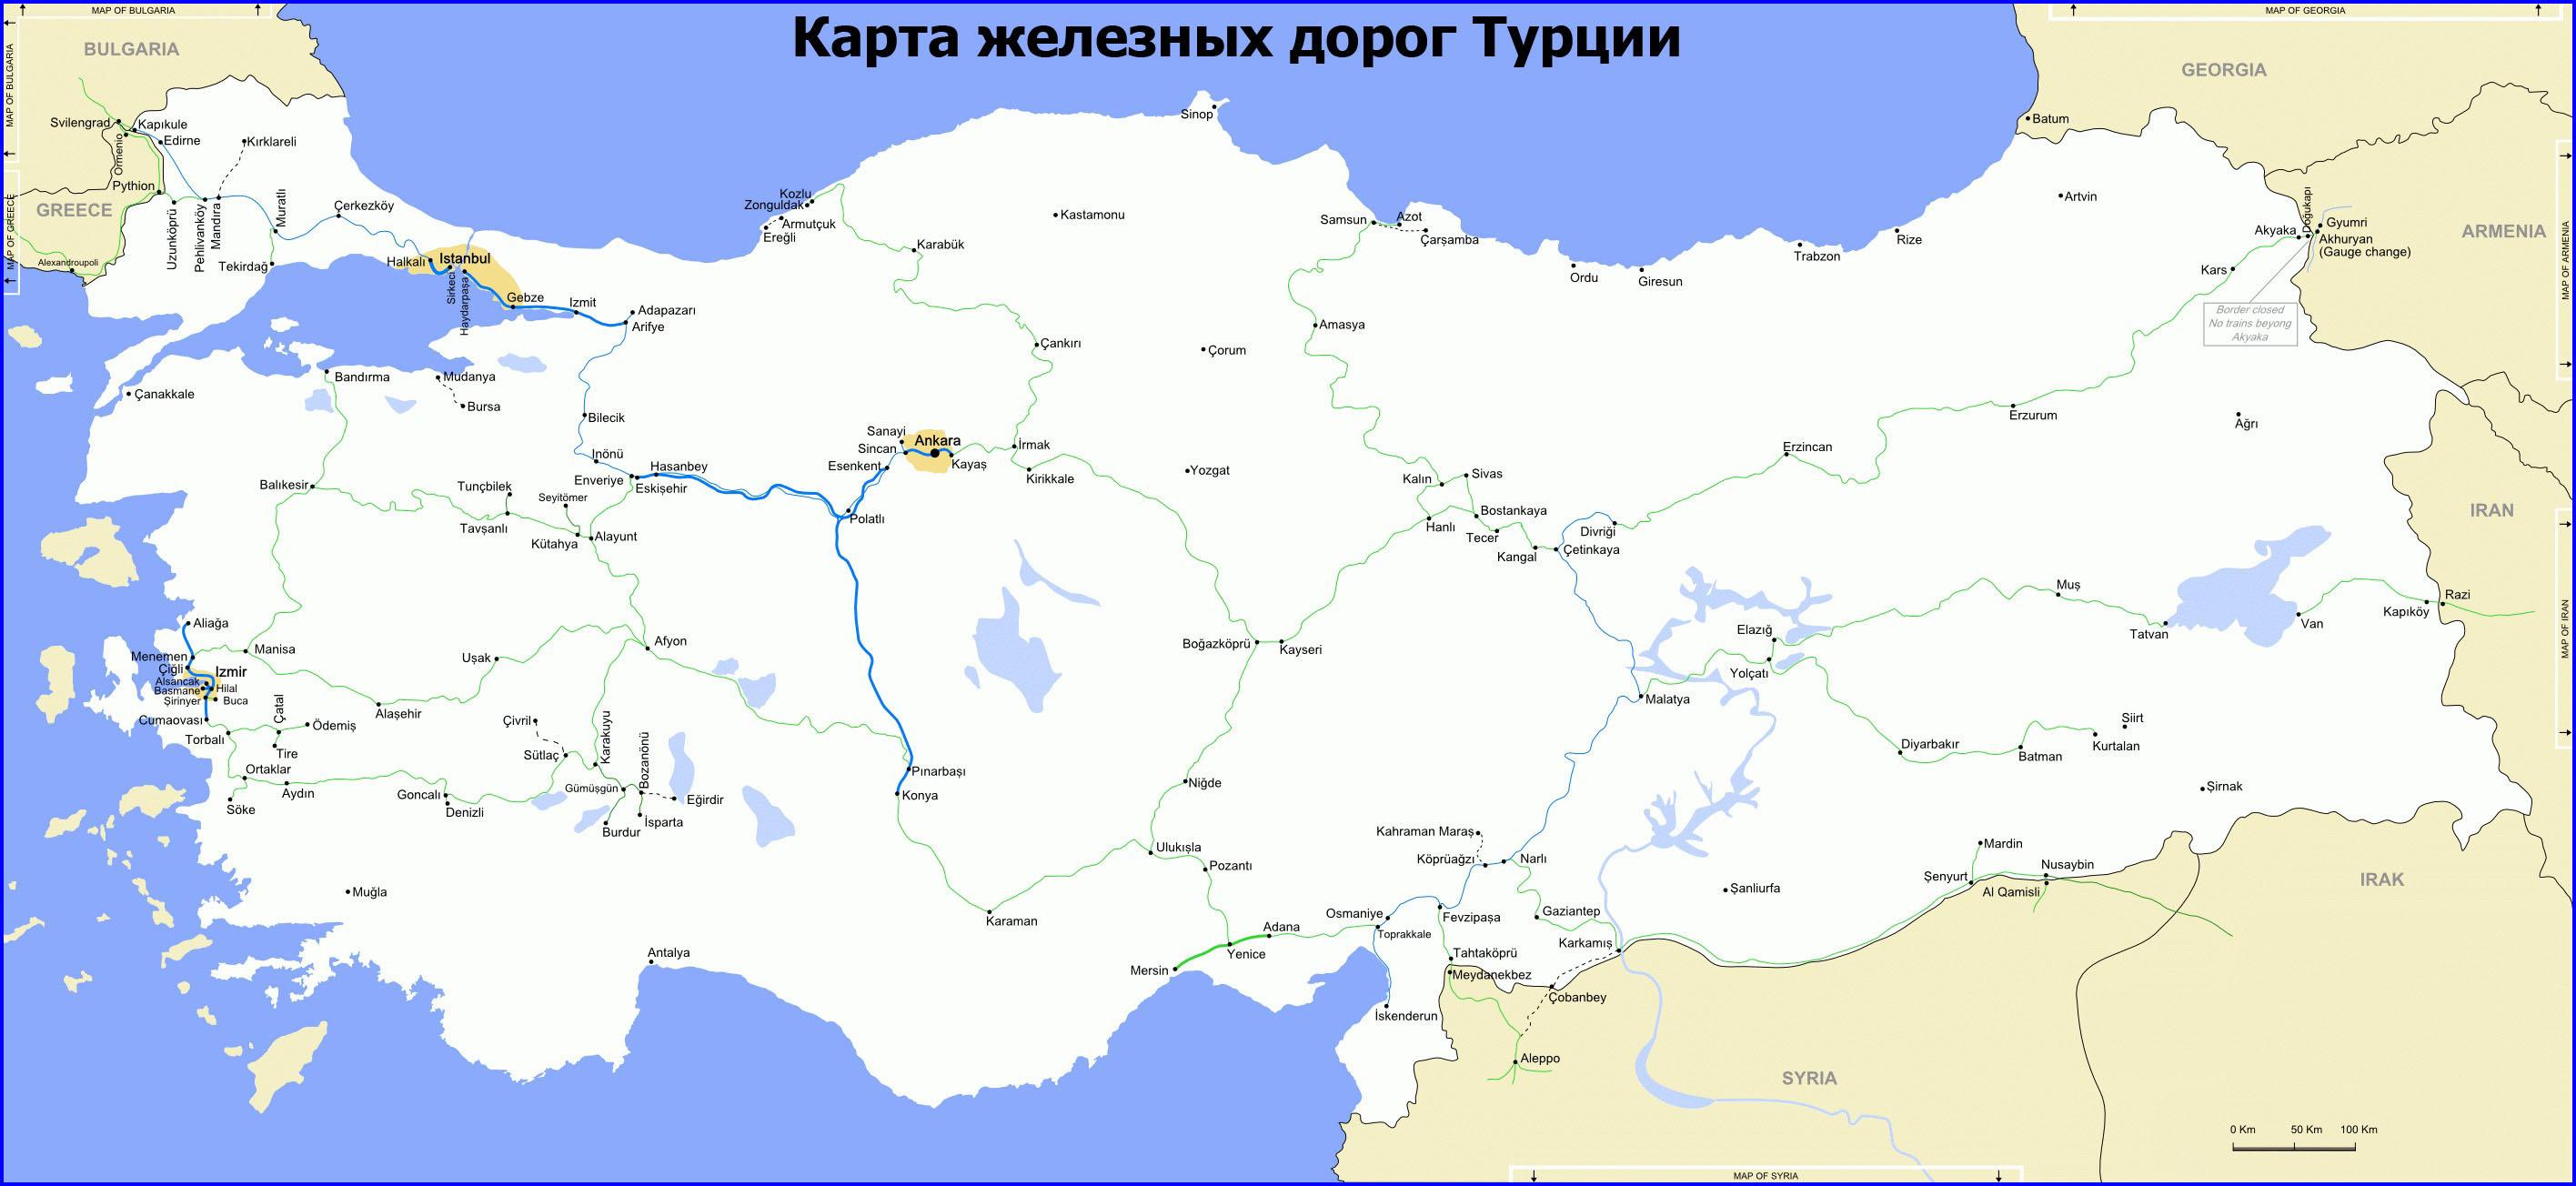 Карта железных дорог Турции